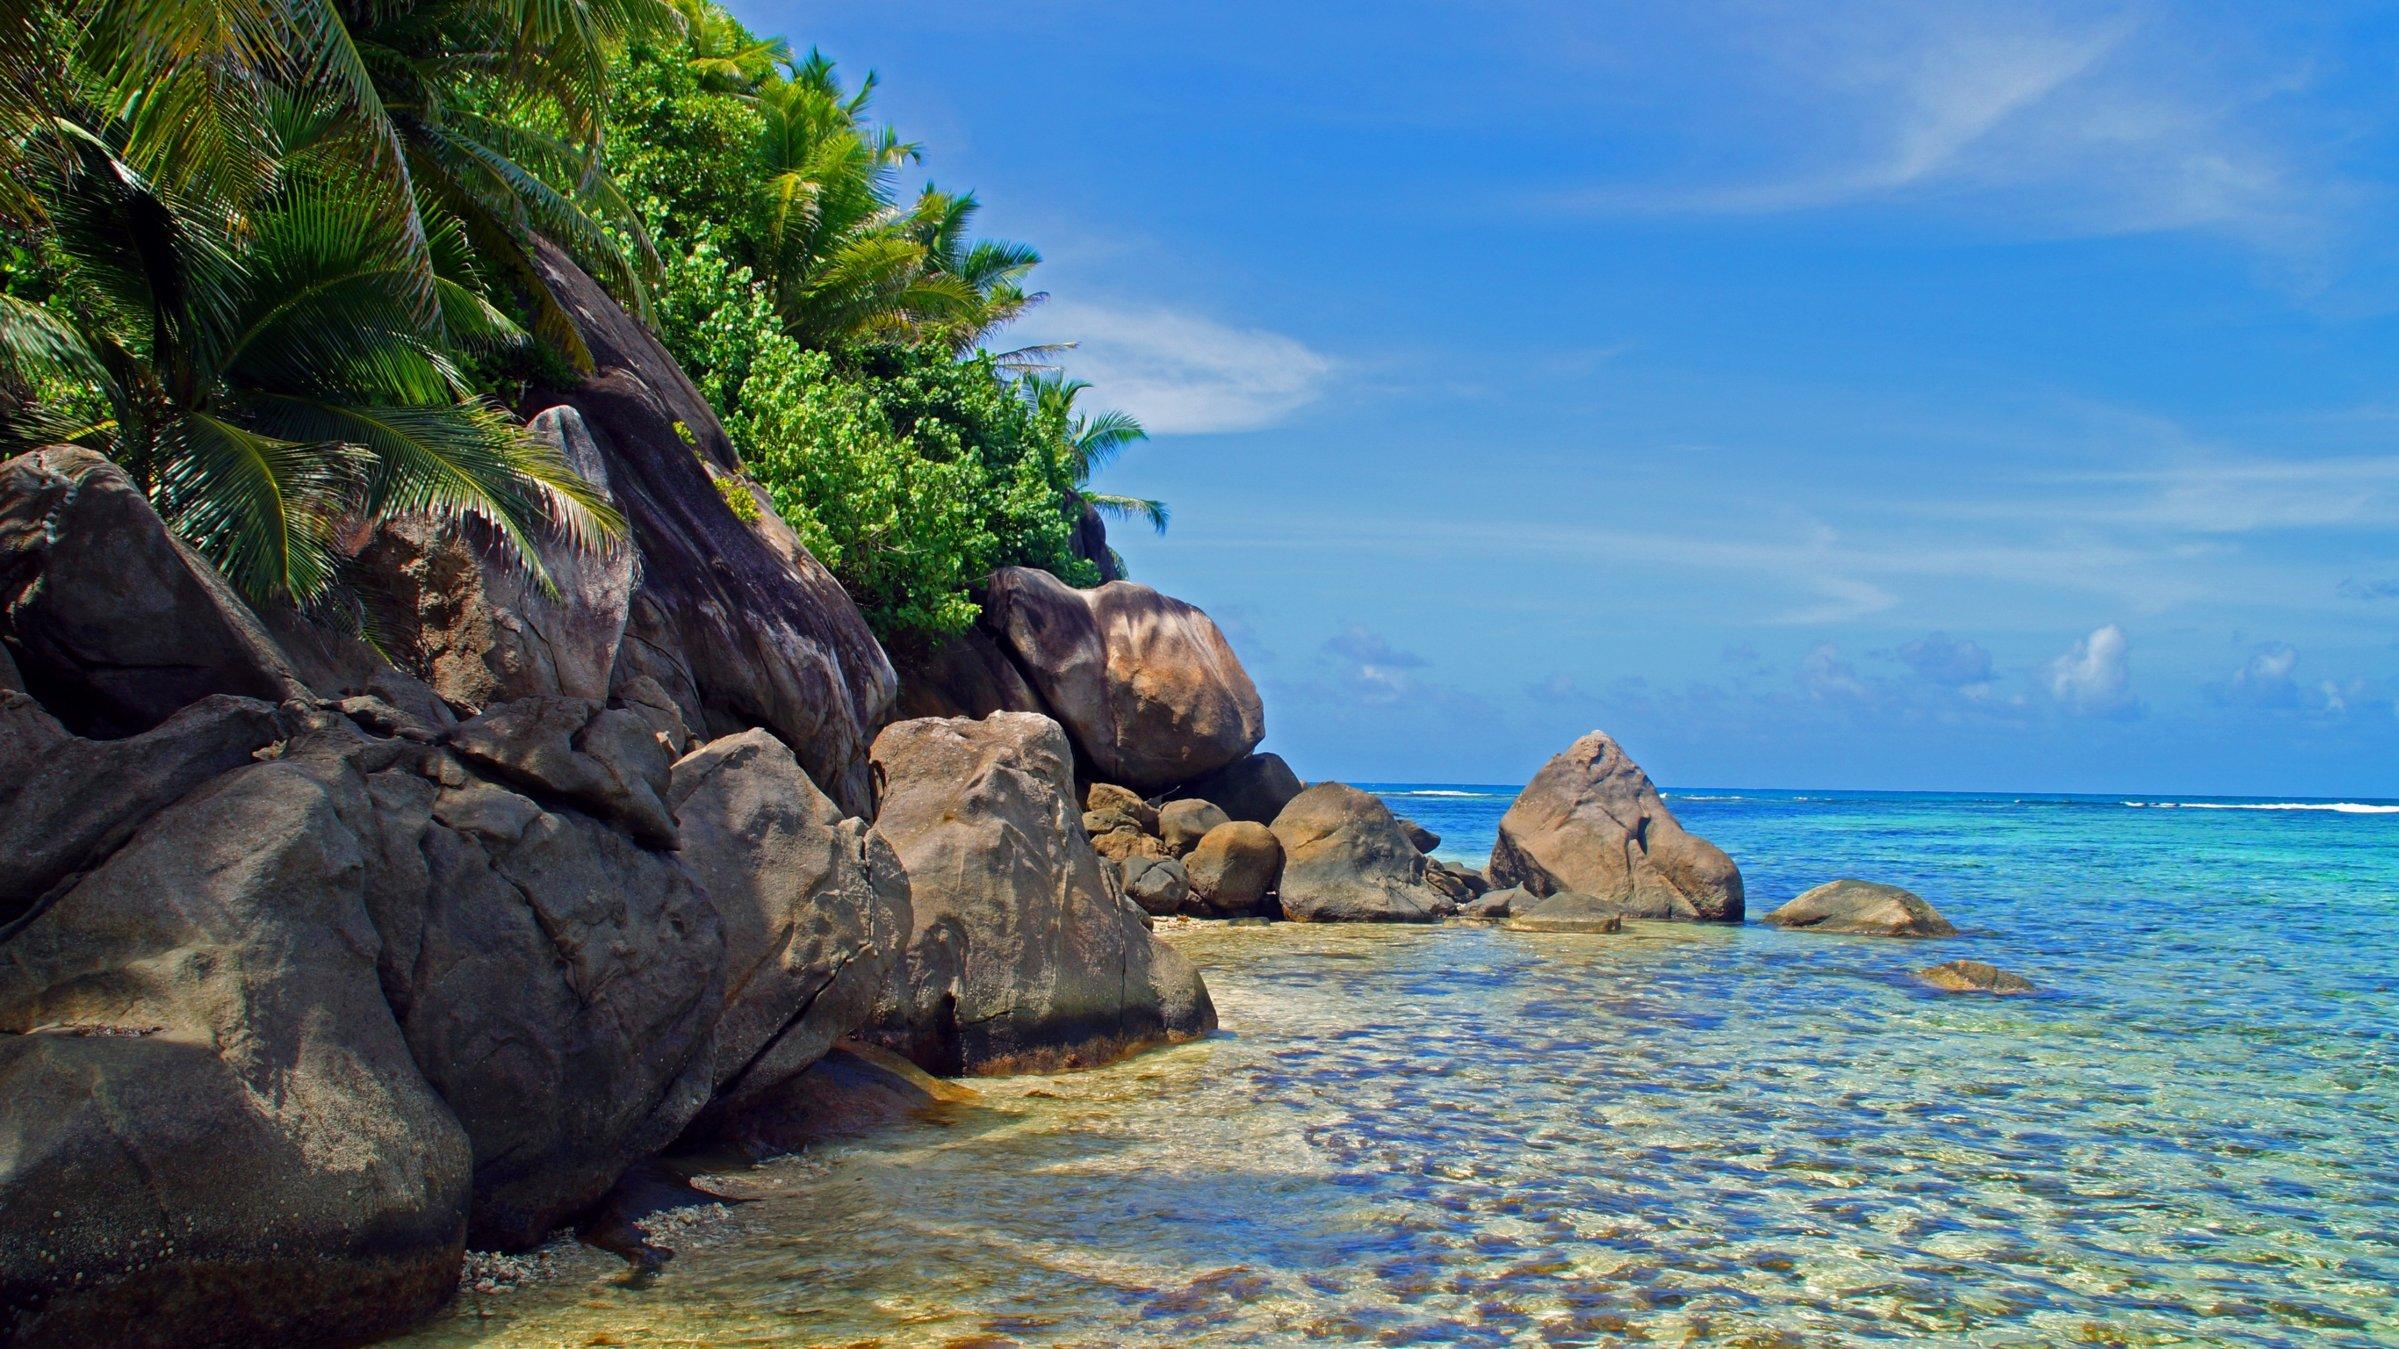 7-Day Beach Bliss Getaway - Seychelles Itinerary